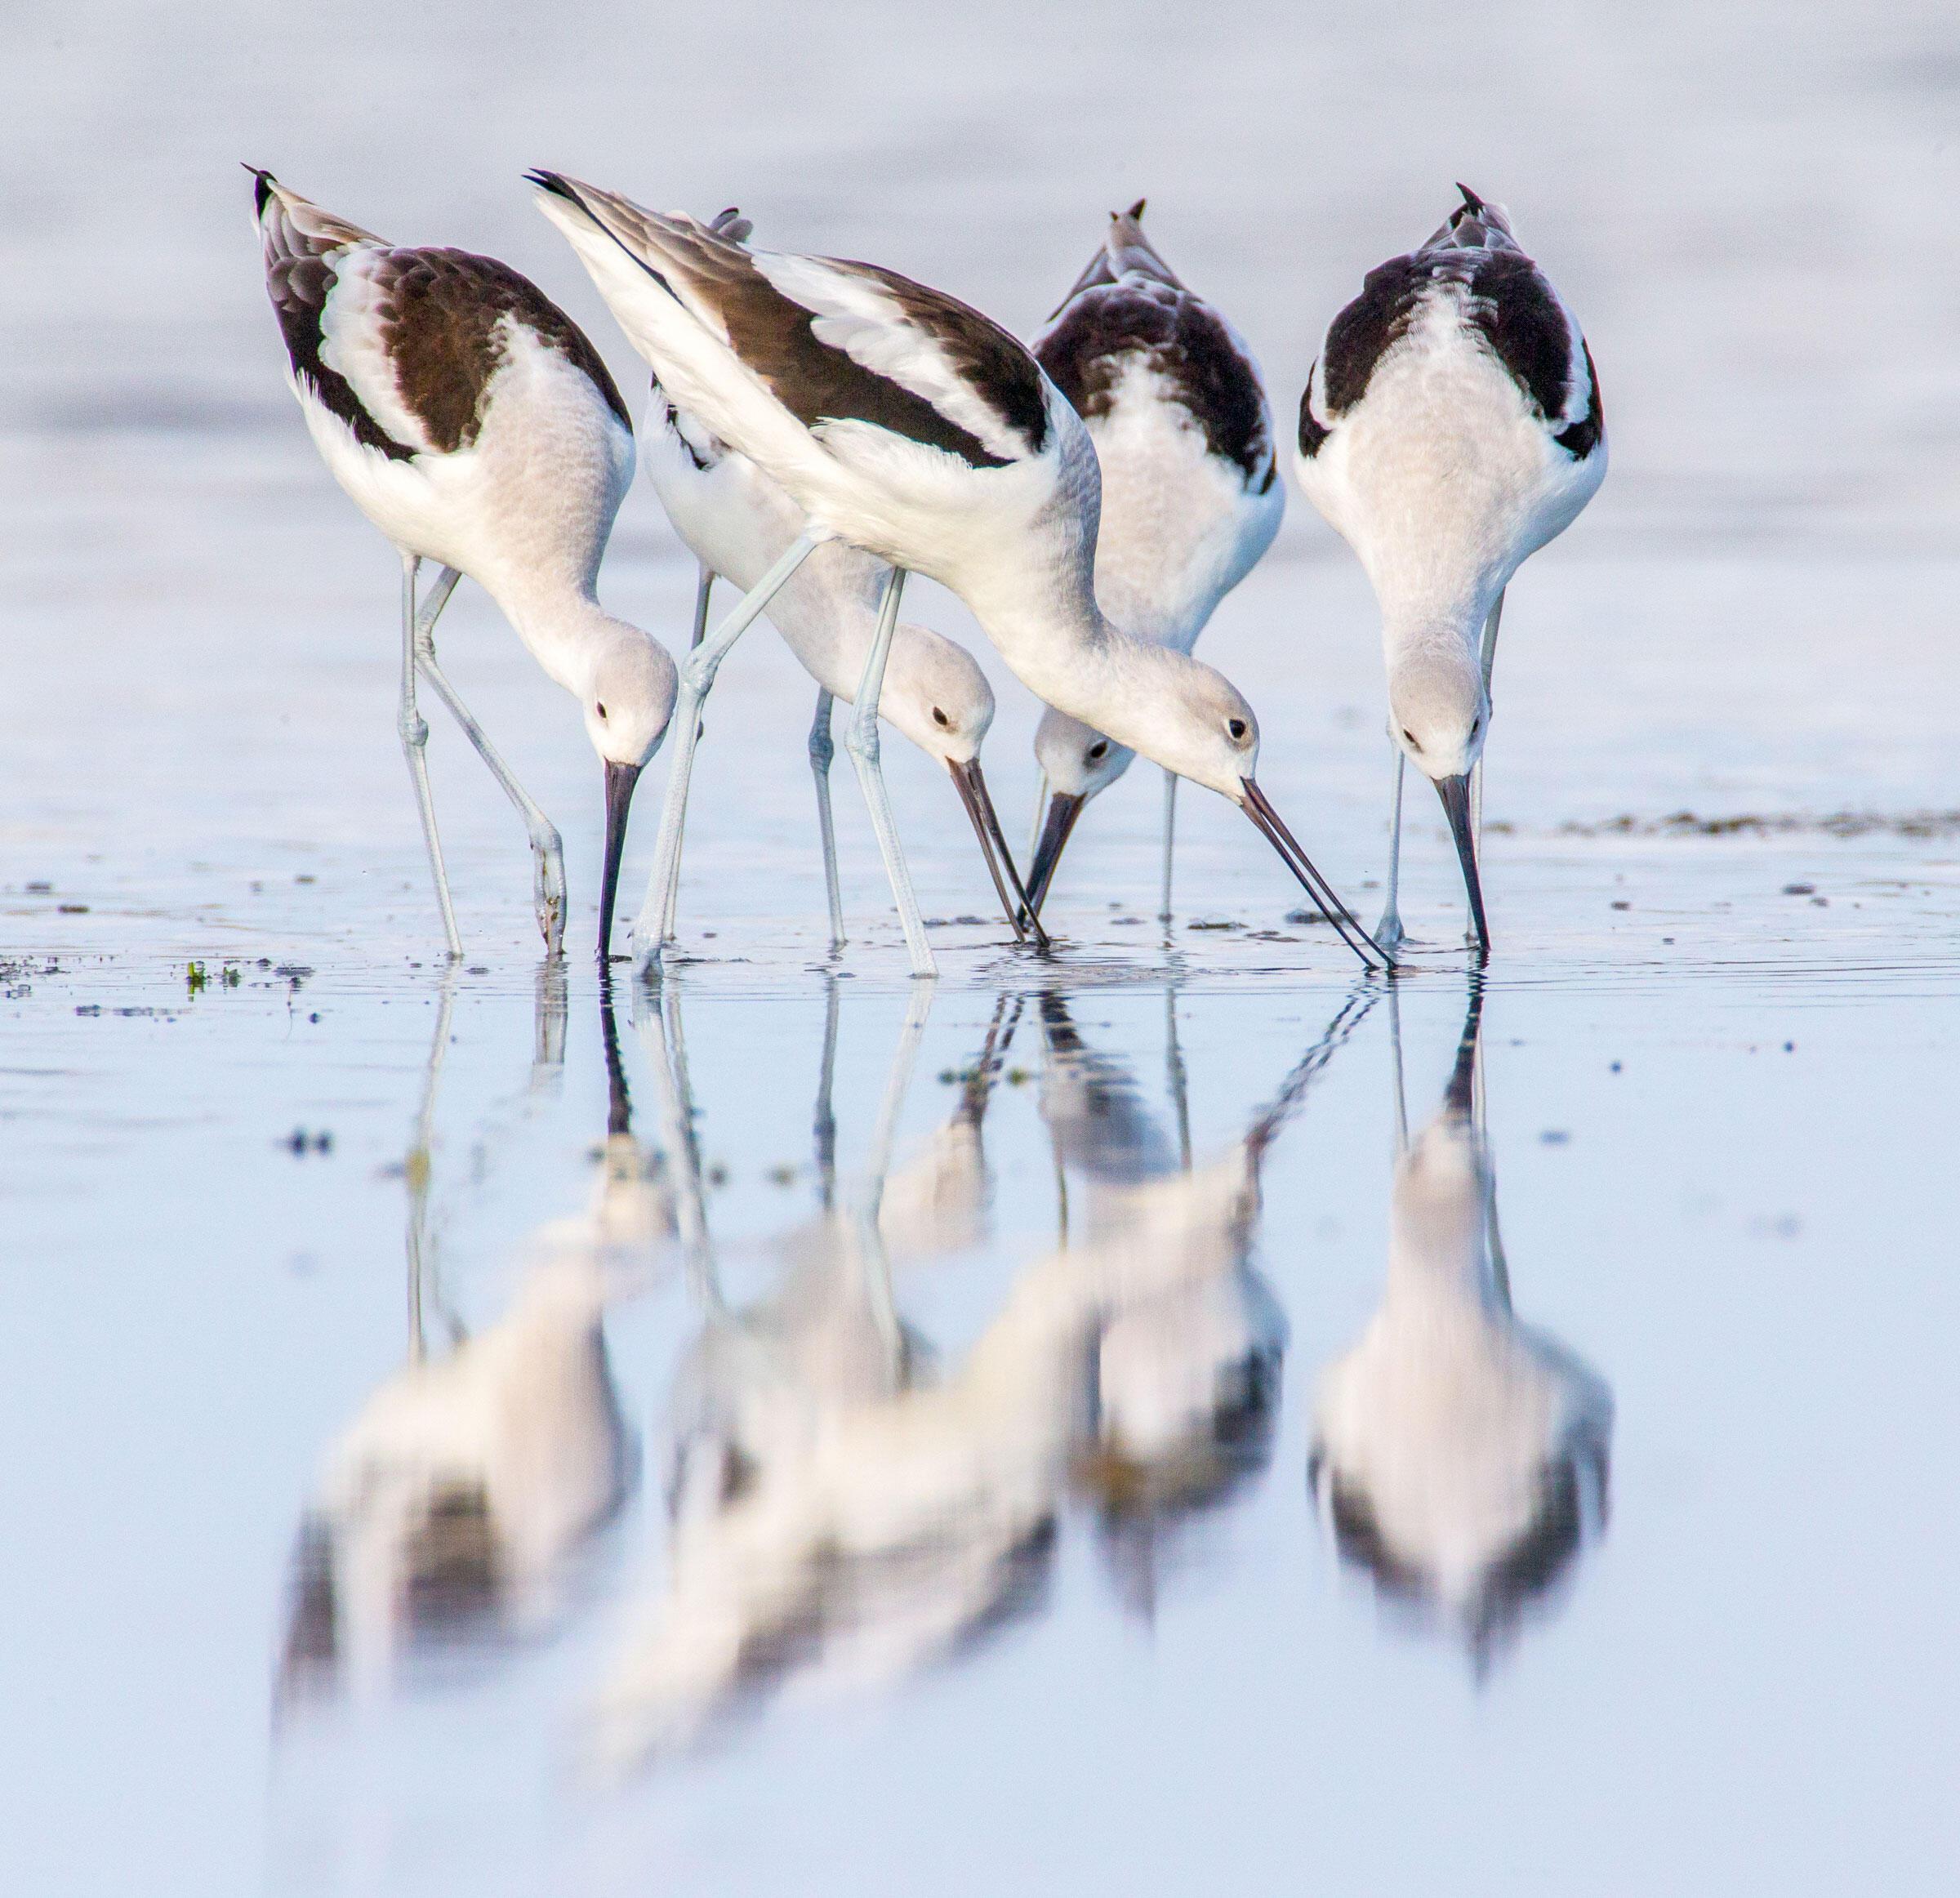 American Avocets/Professional Category. Mark Buckler/Audubon Photography Awards